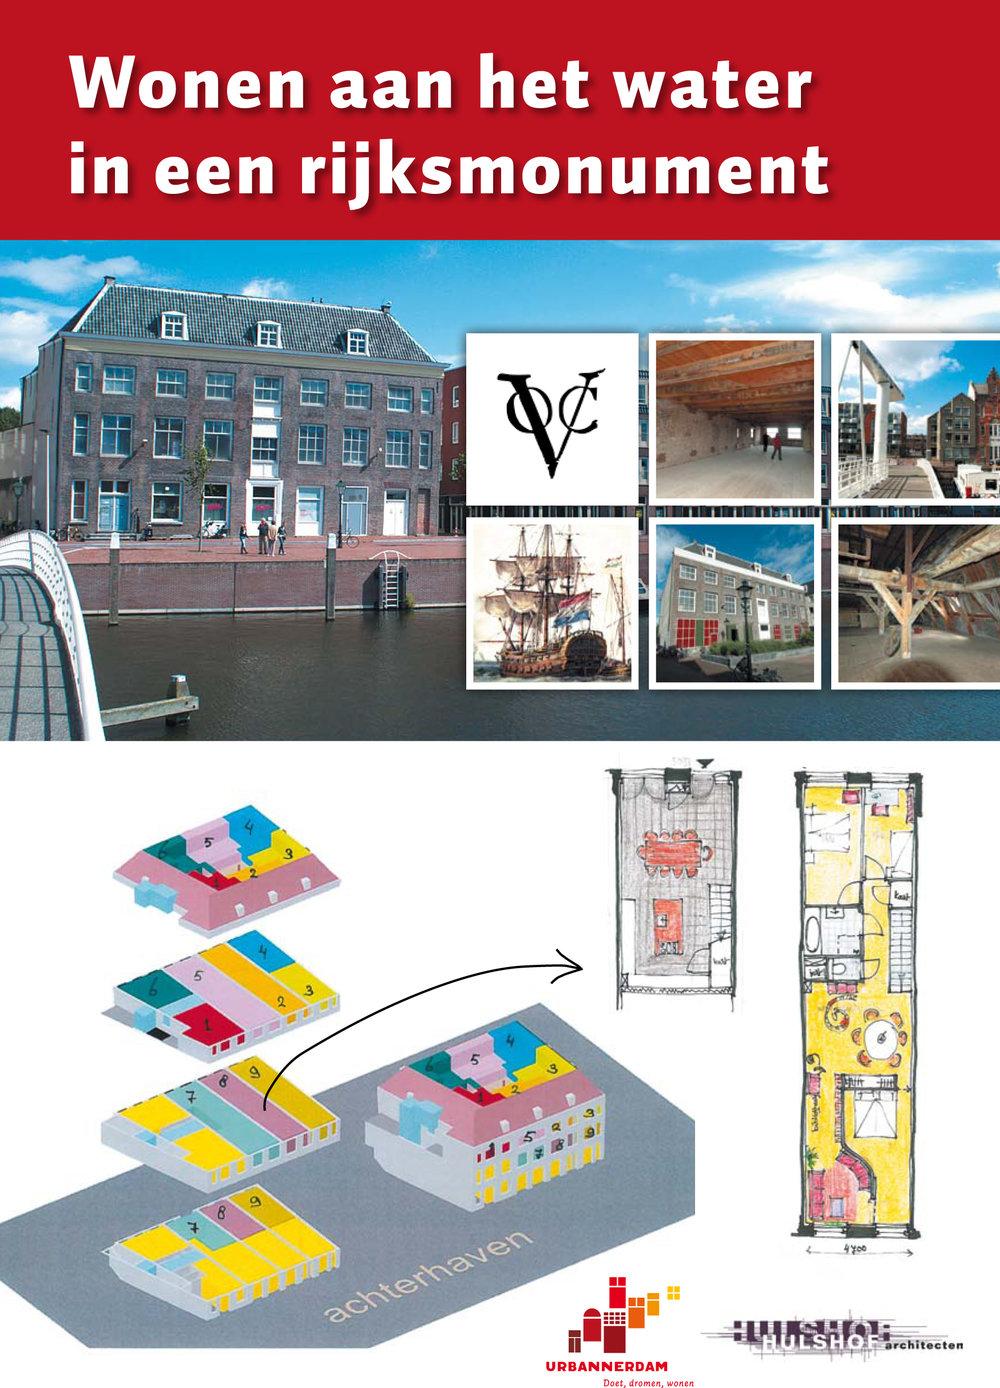 urbannerdam_voc_flyer_a5_2014_v21_copy1.jpg